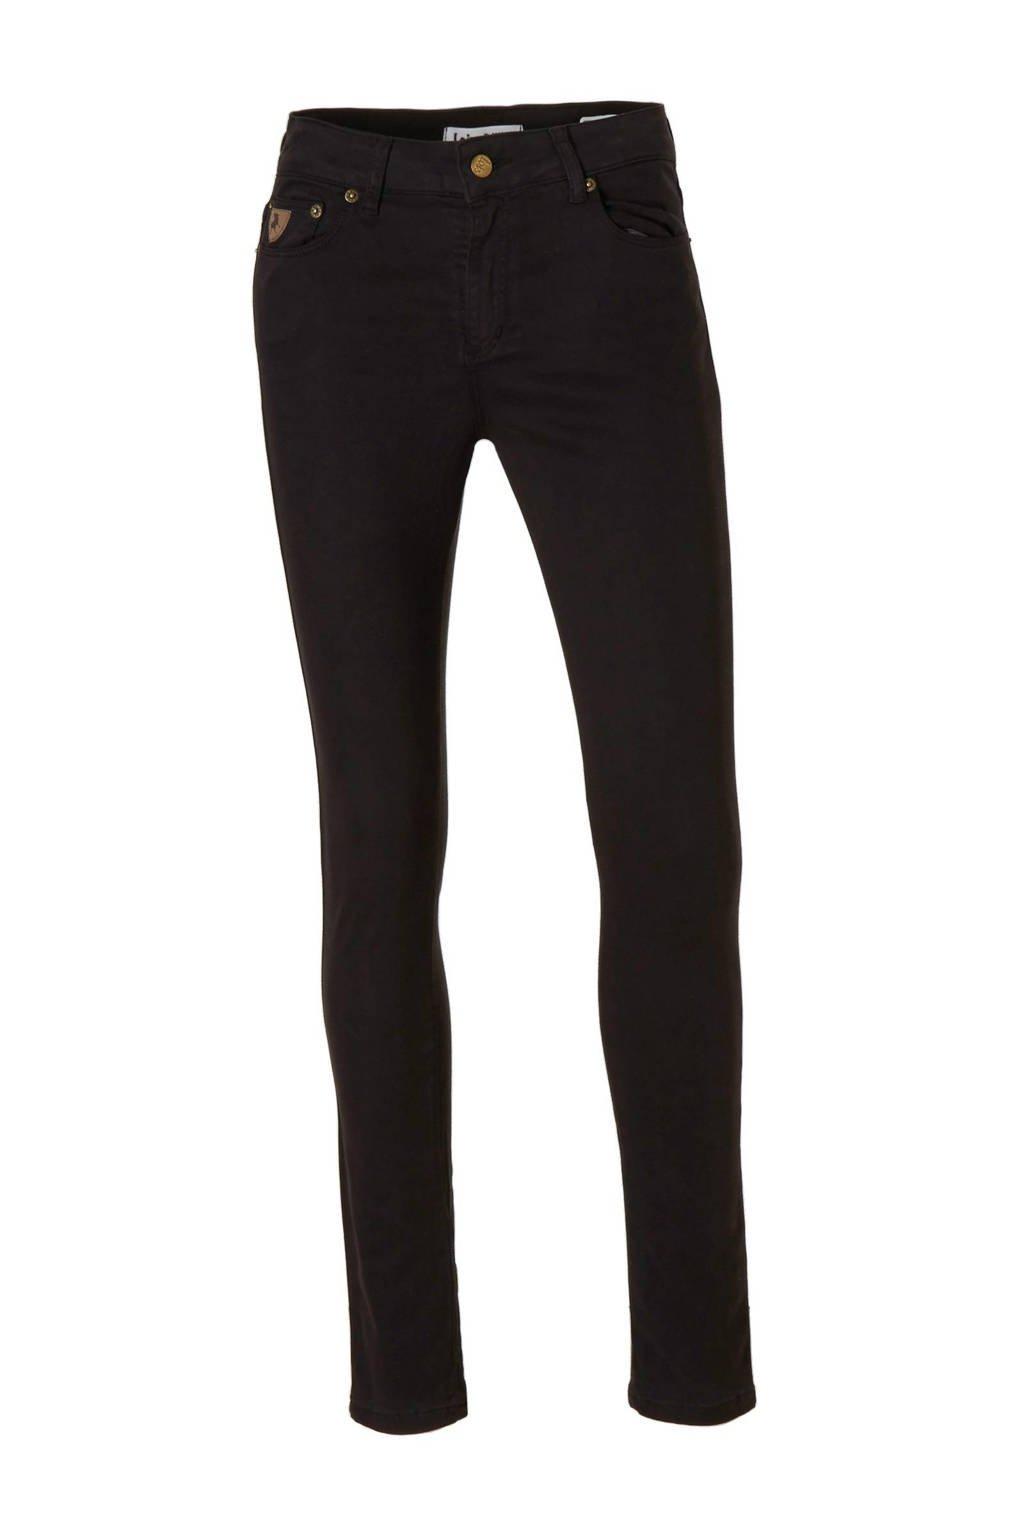 Lois Cordoba 5043 high waist skinny fit ankle jeans, Black